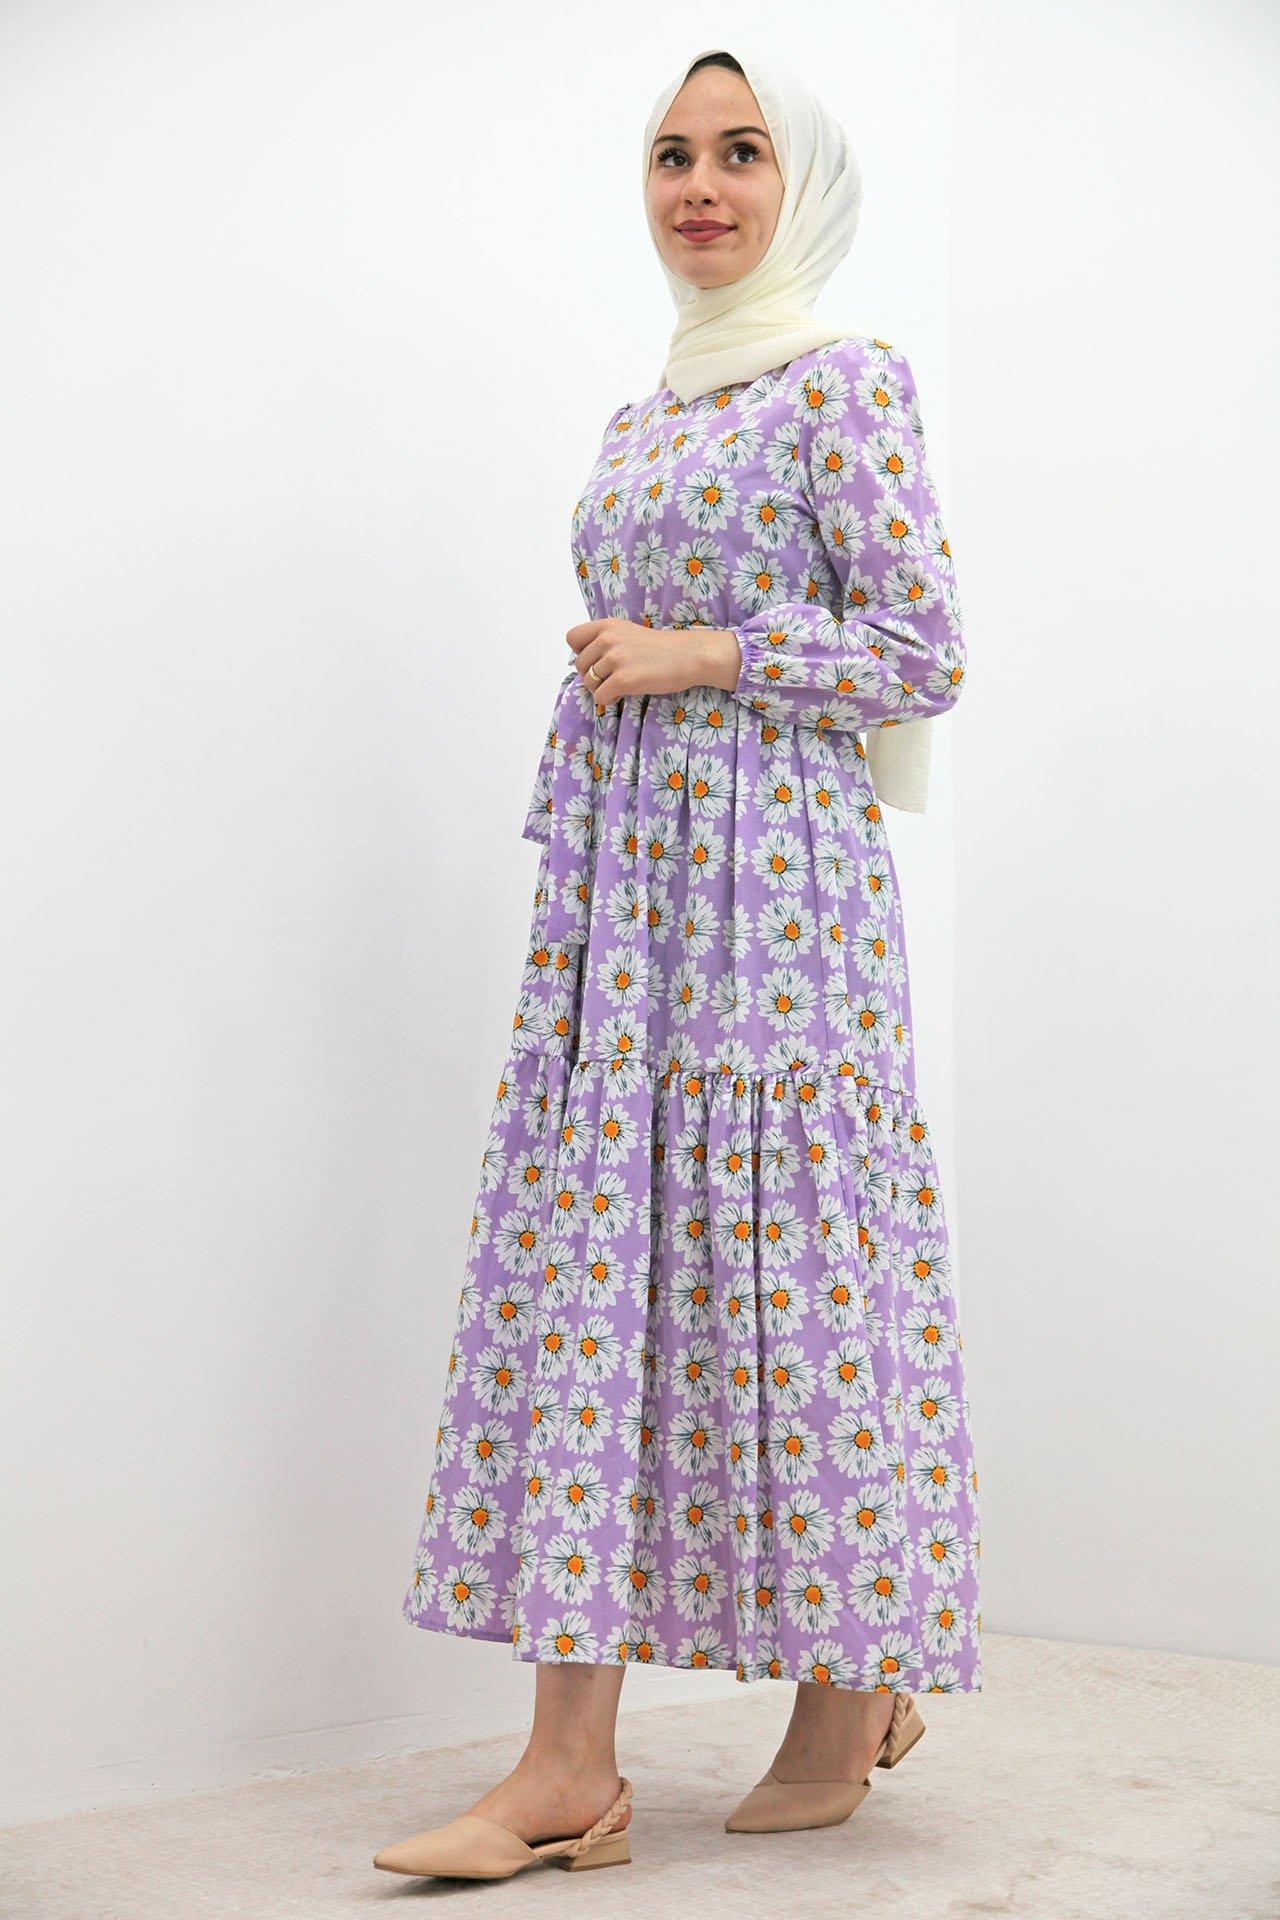 GİZAGİYİM - Beyaz Papatyalı Elbise Lila